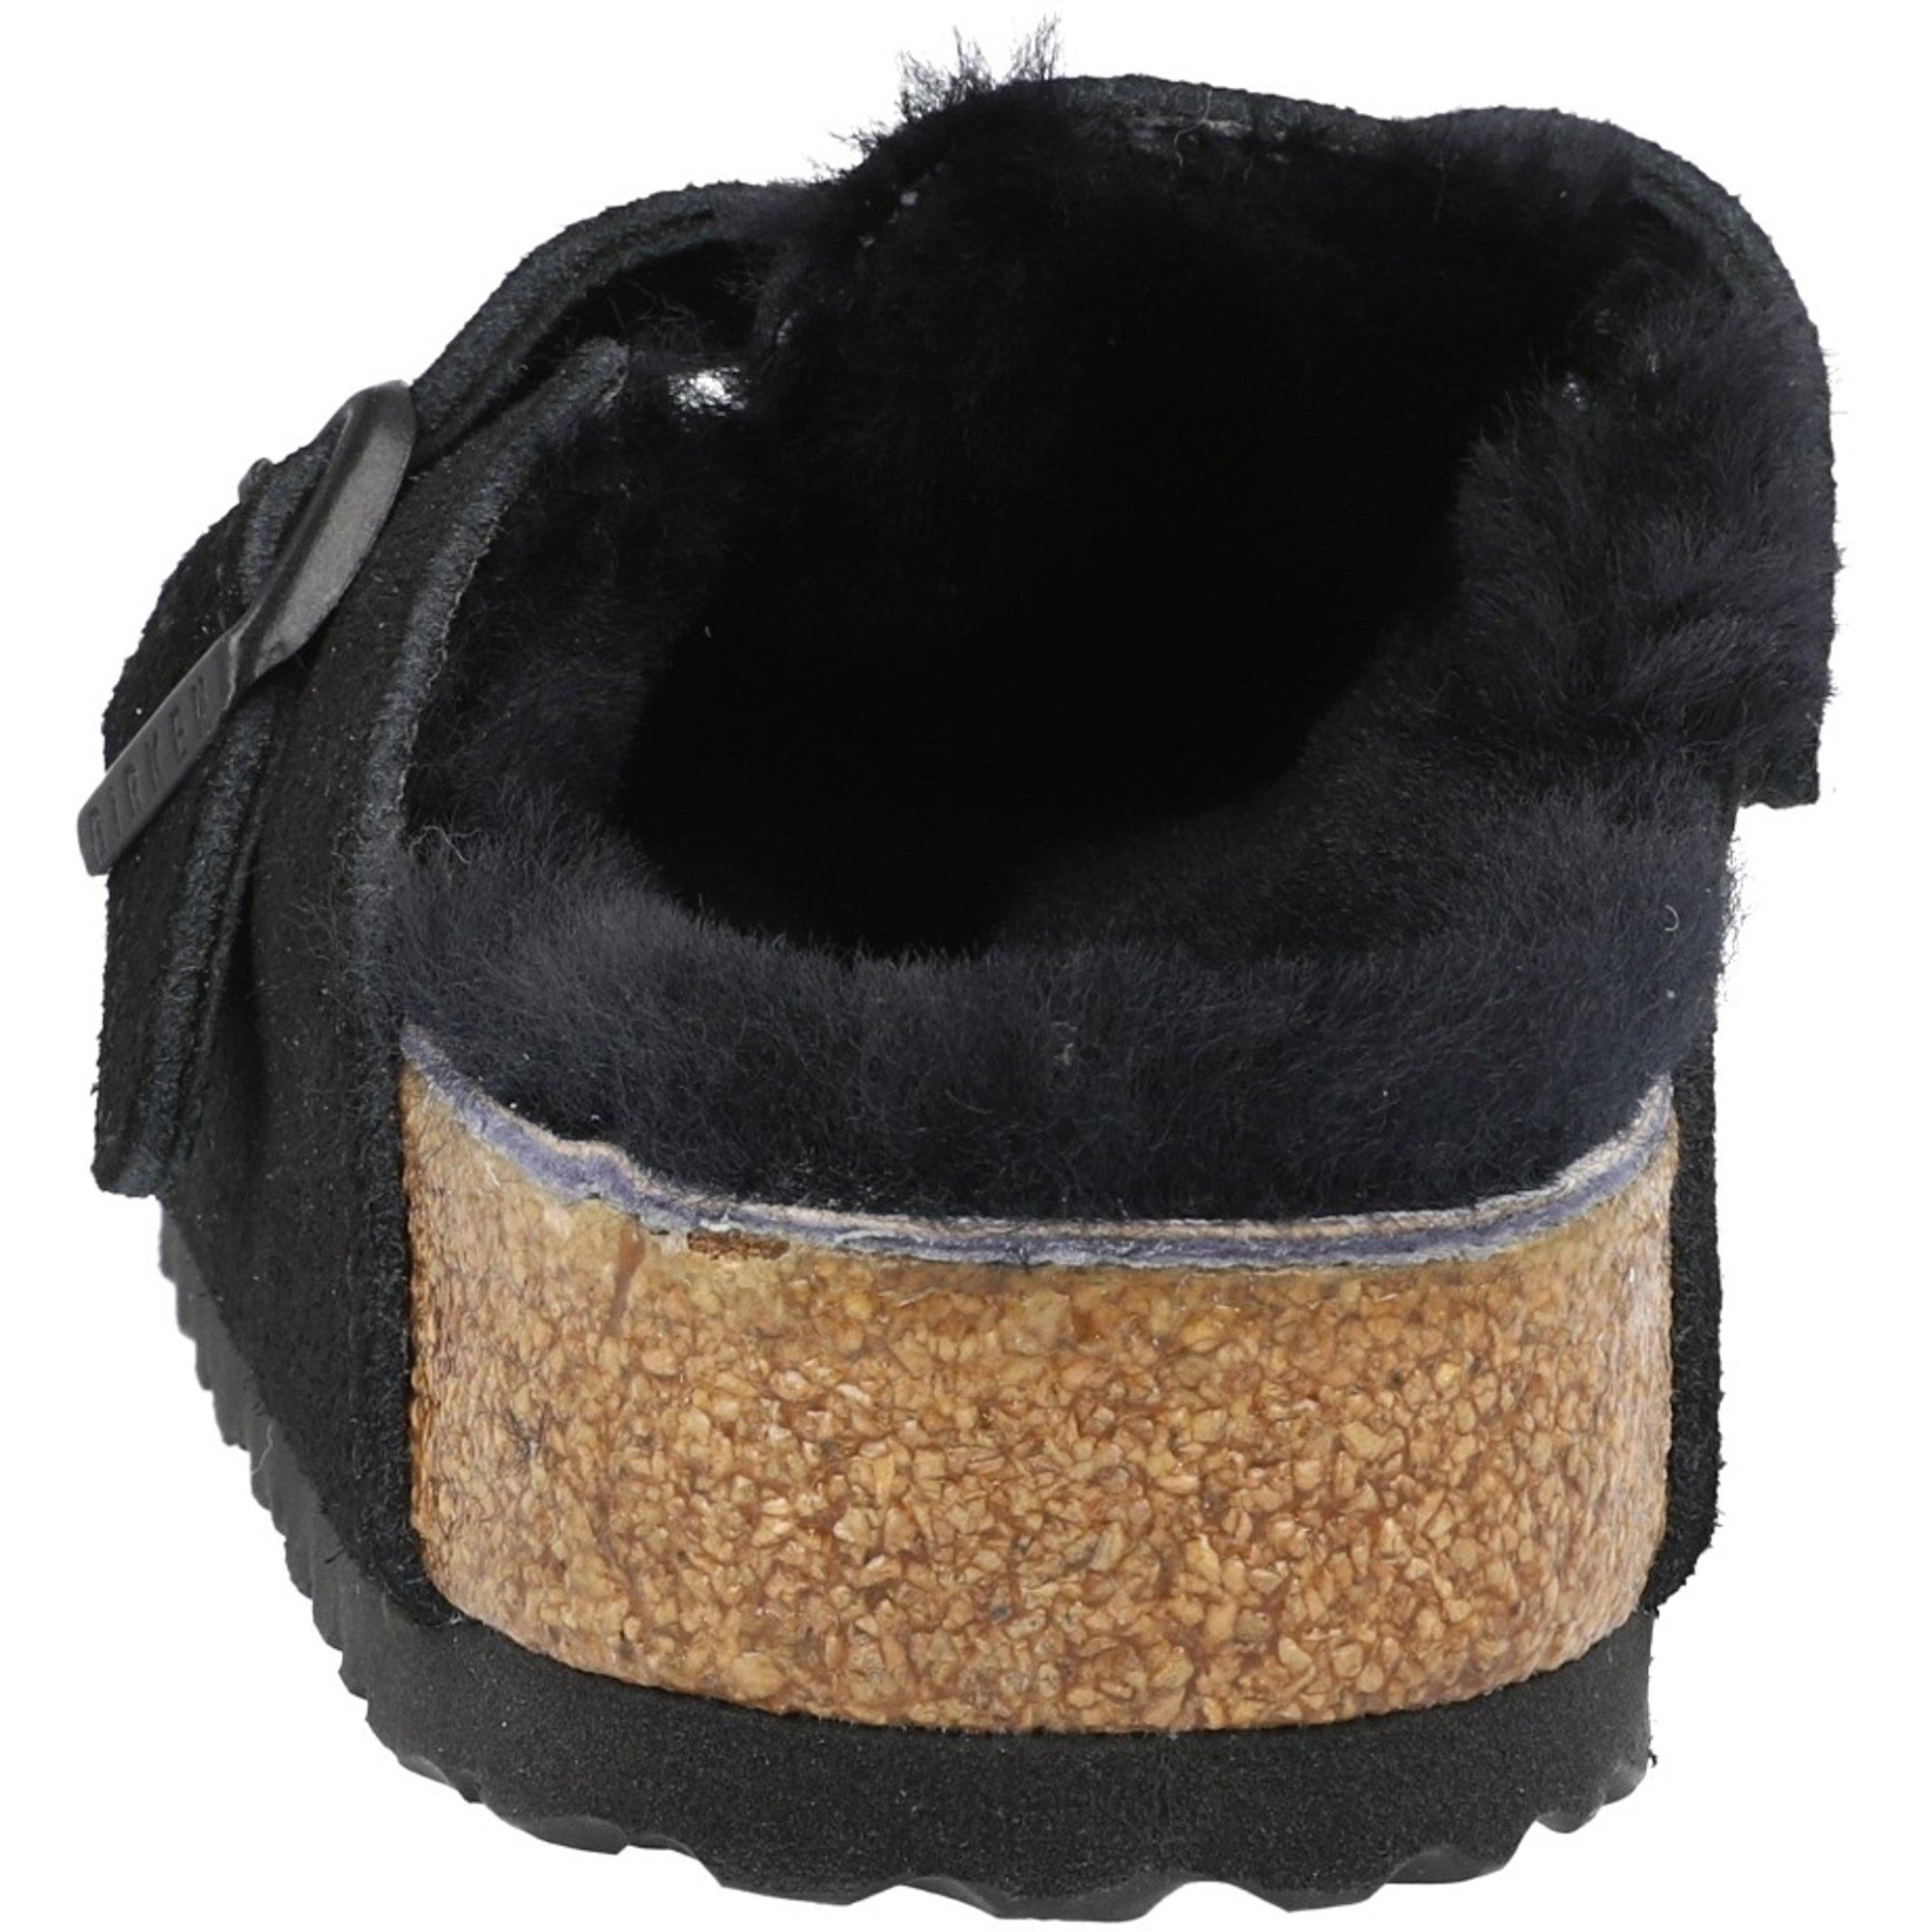 Birkenstock Boston Fur Black Suede